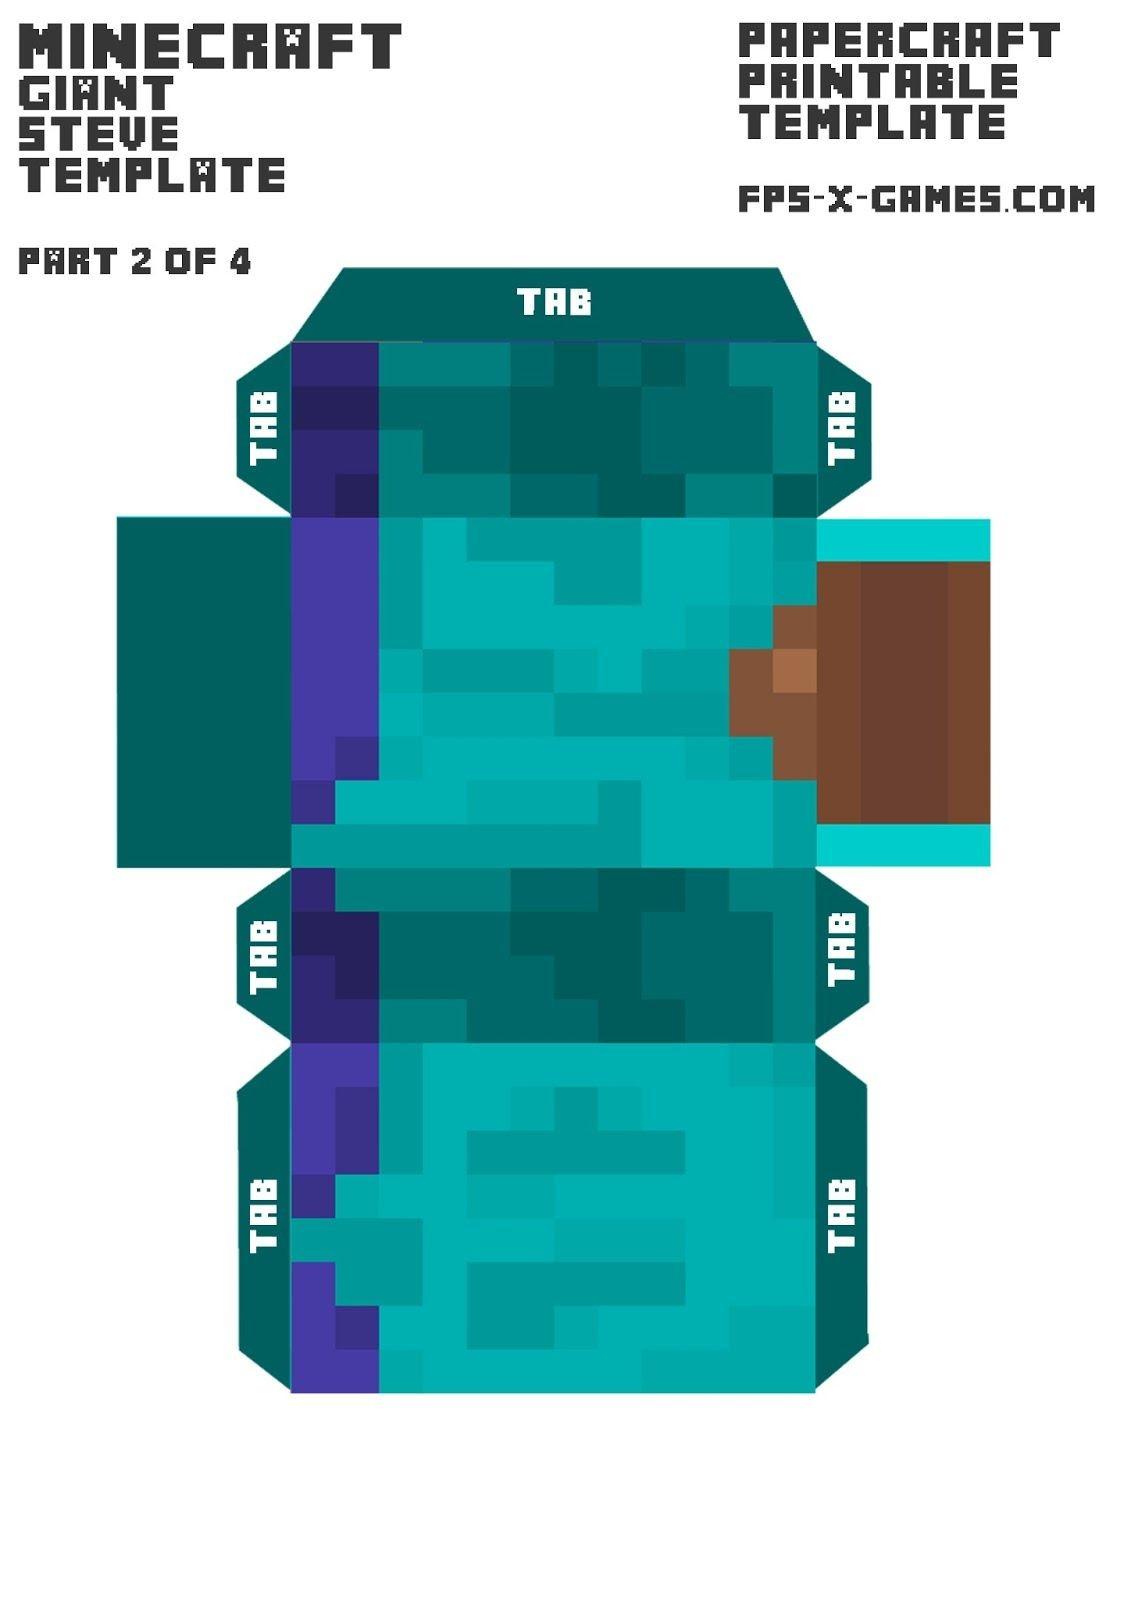 Minecraft Steve Papercraft Minecraft Giant Steve Arms Template 3 4